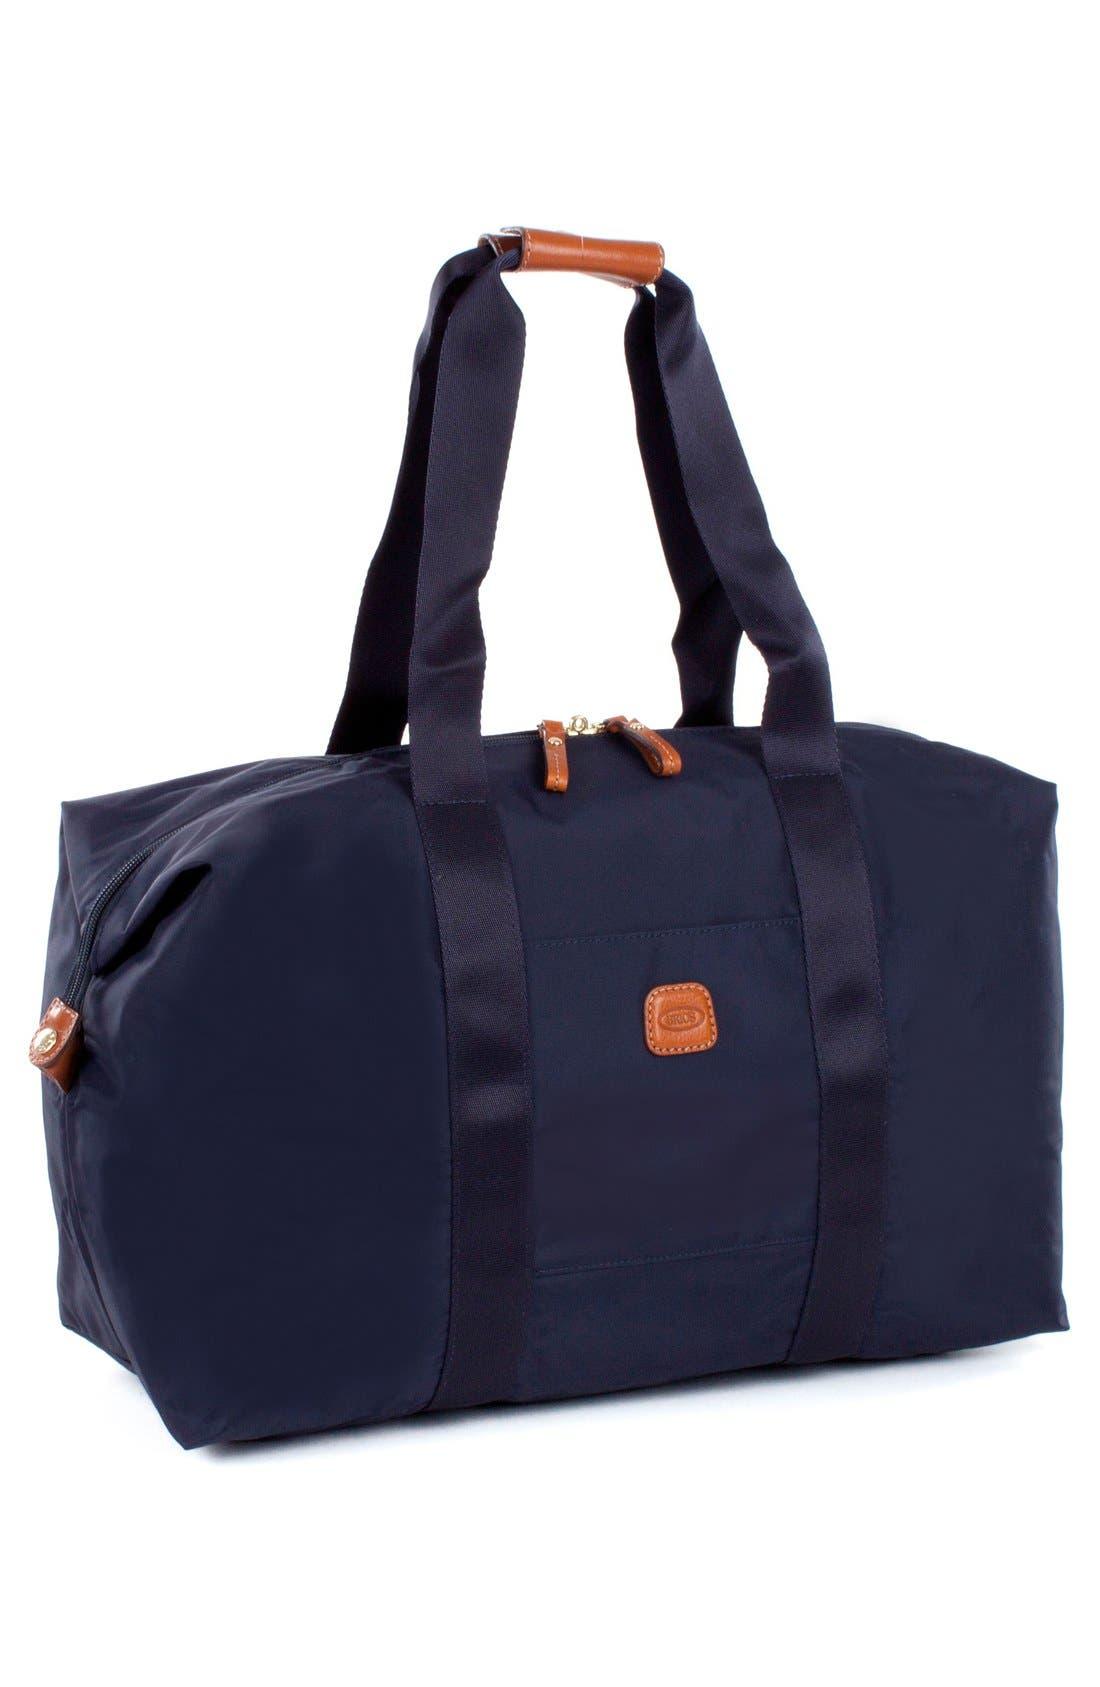 'X-Bag' Folding Duffel Bag,                             Alternate thumbnail 2, color,                             410